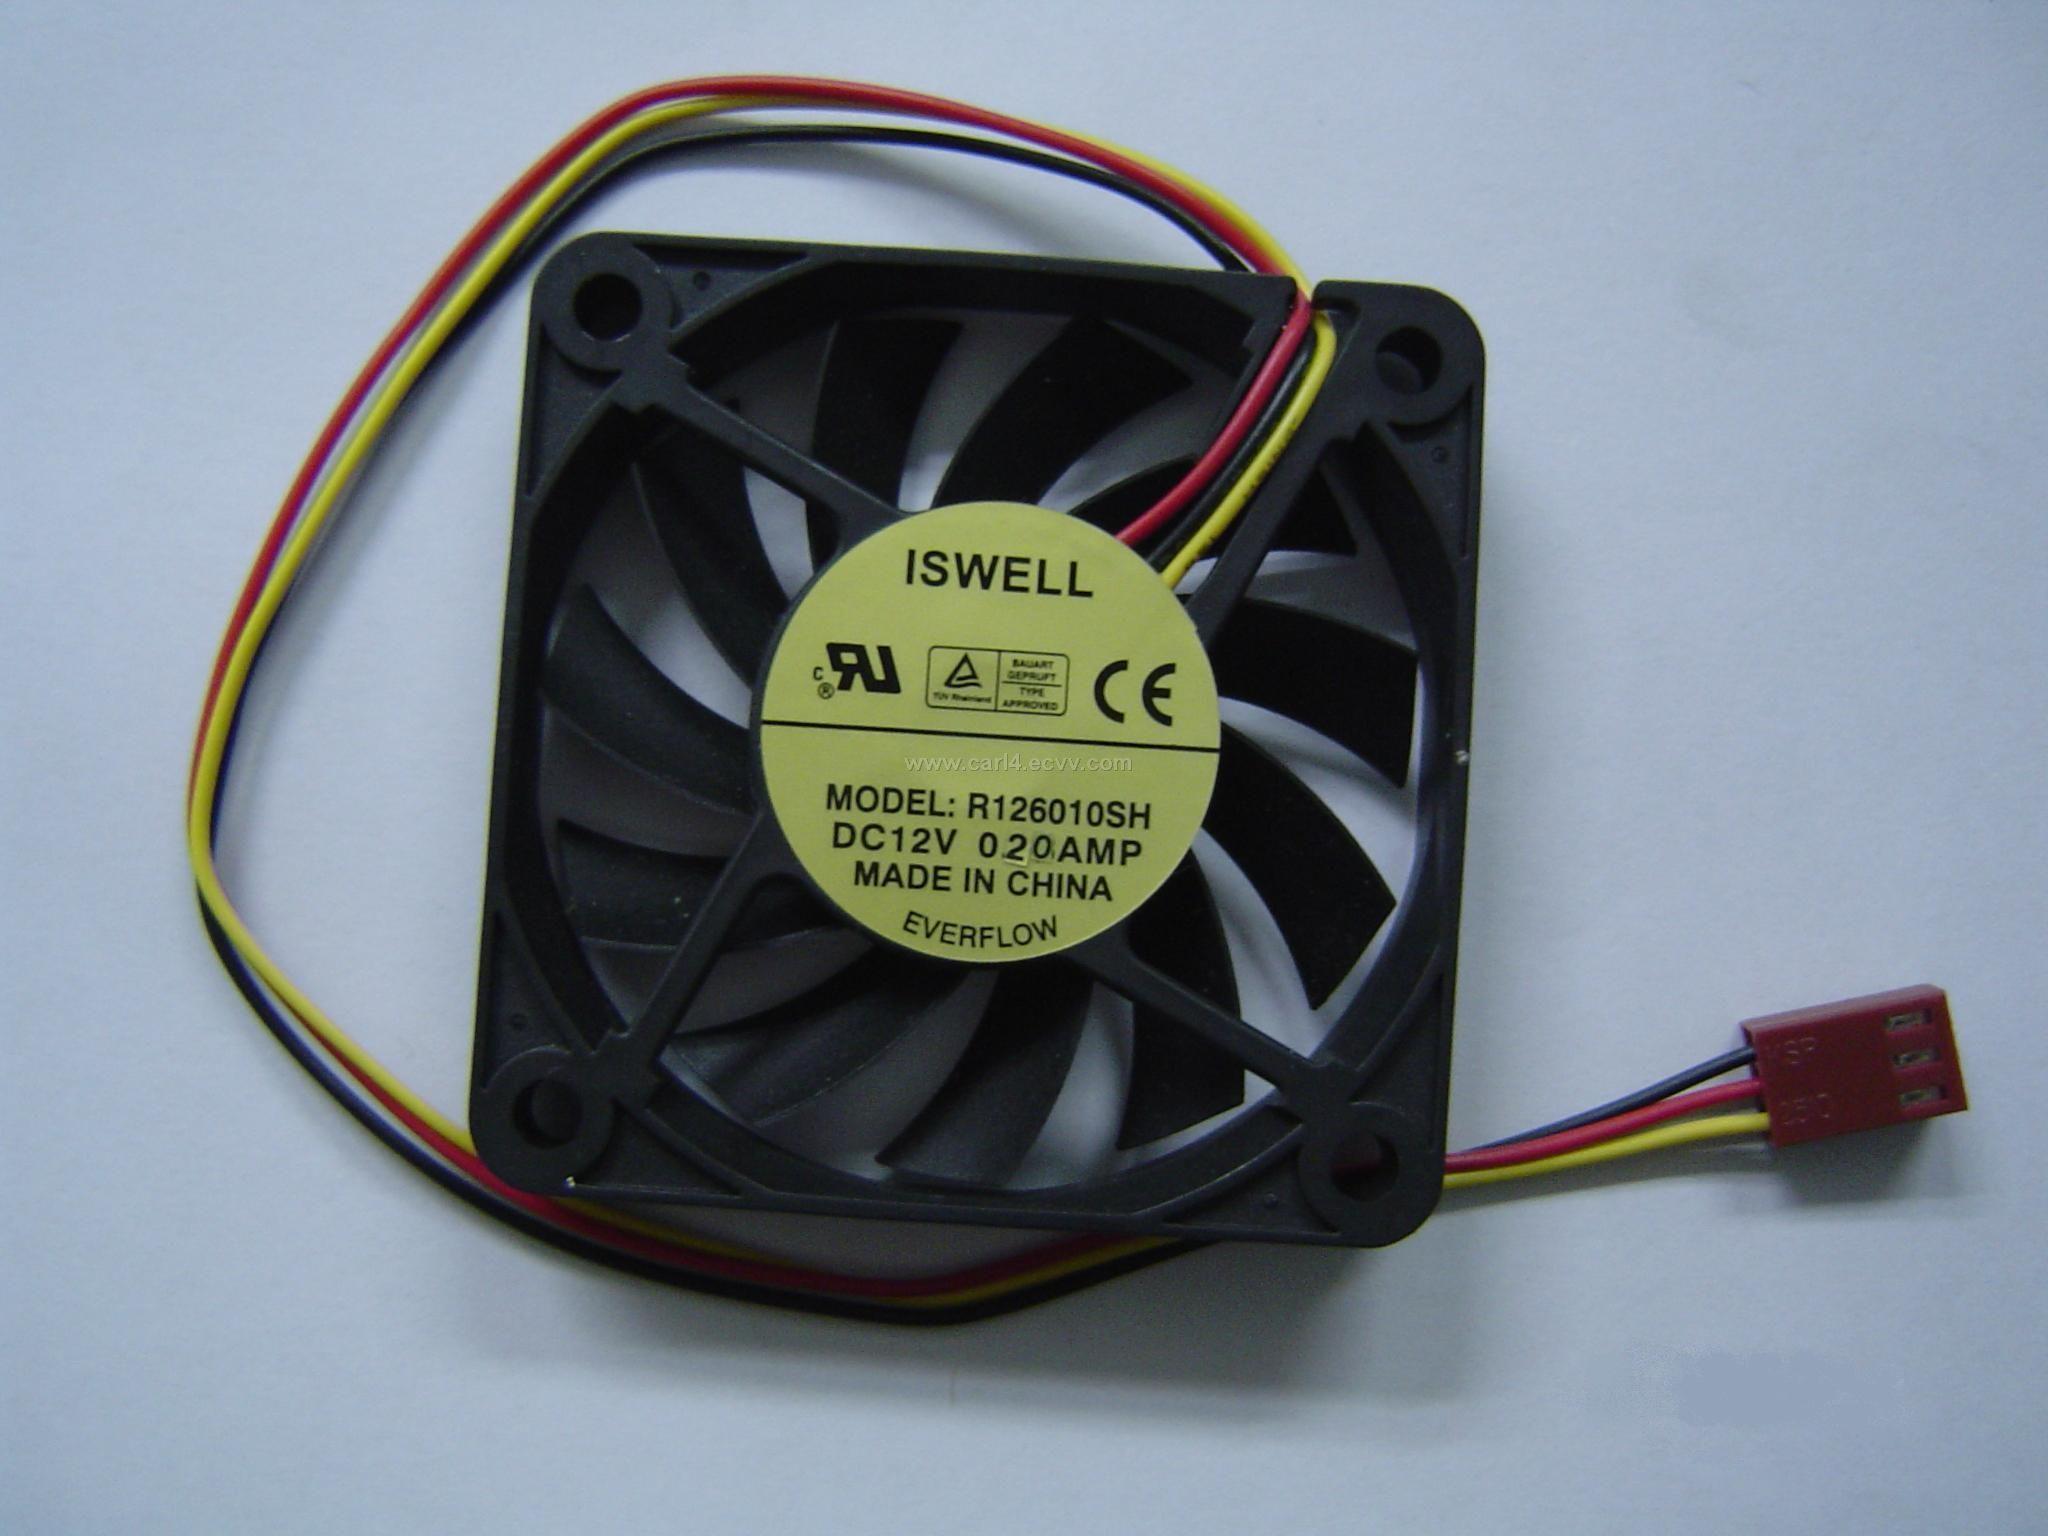 DC Fan R126010DM AI China #79262F